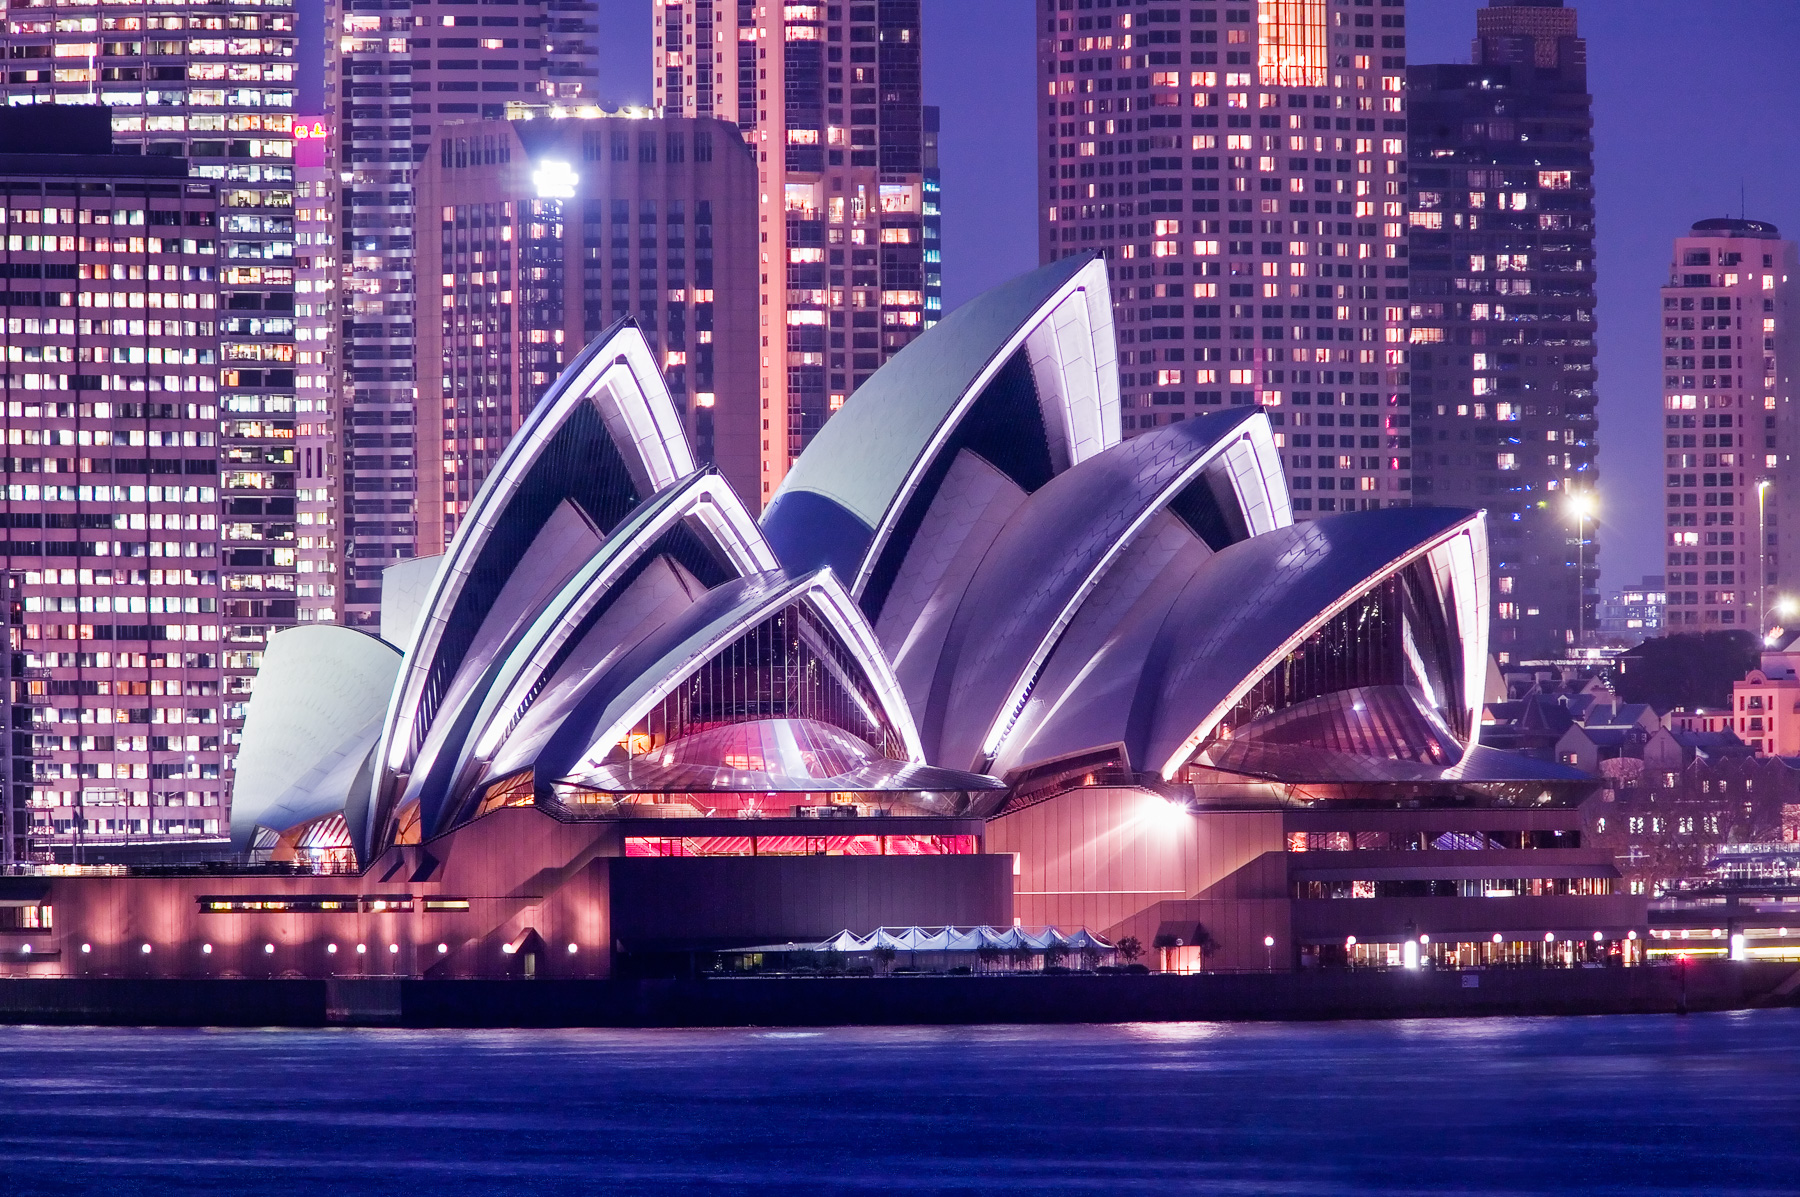 The Sydney Opera House at twilight.